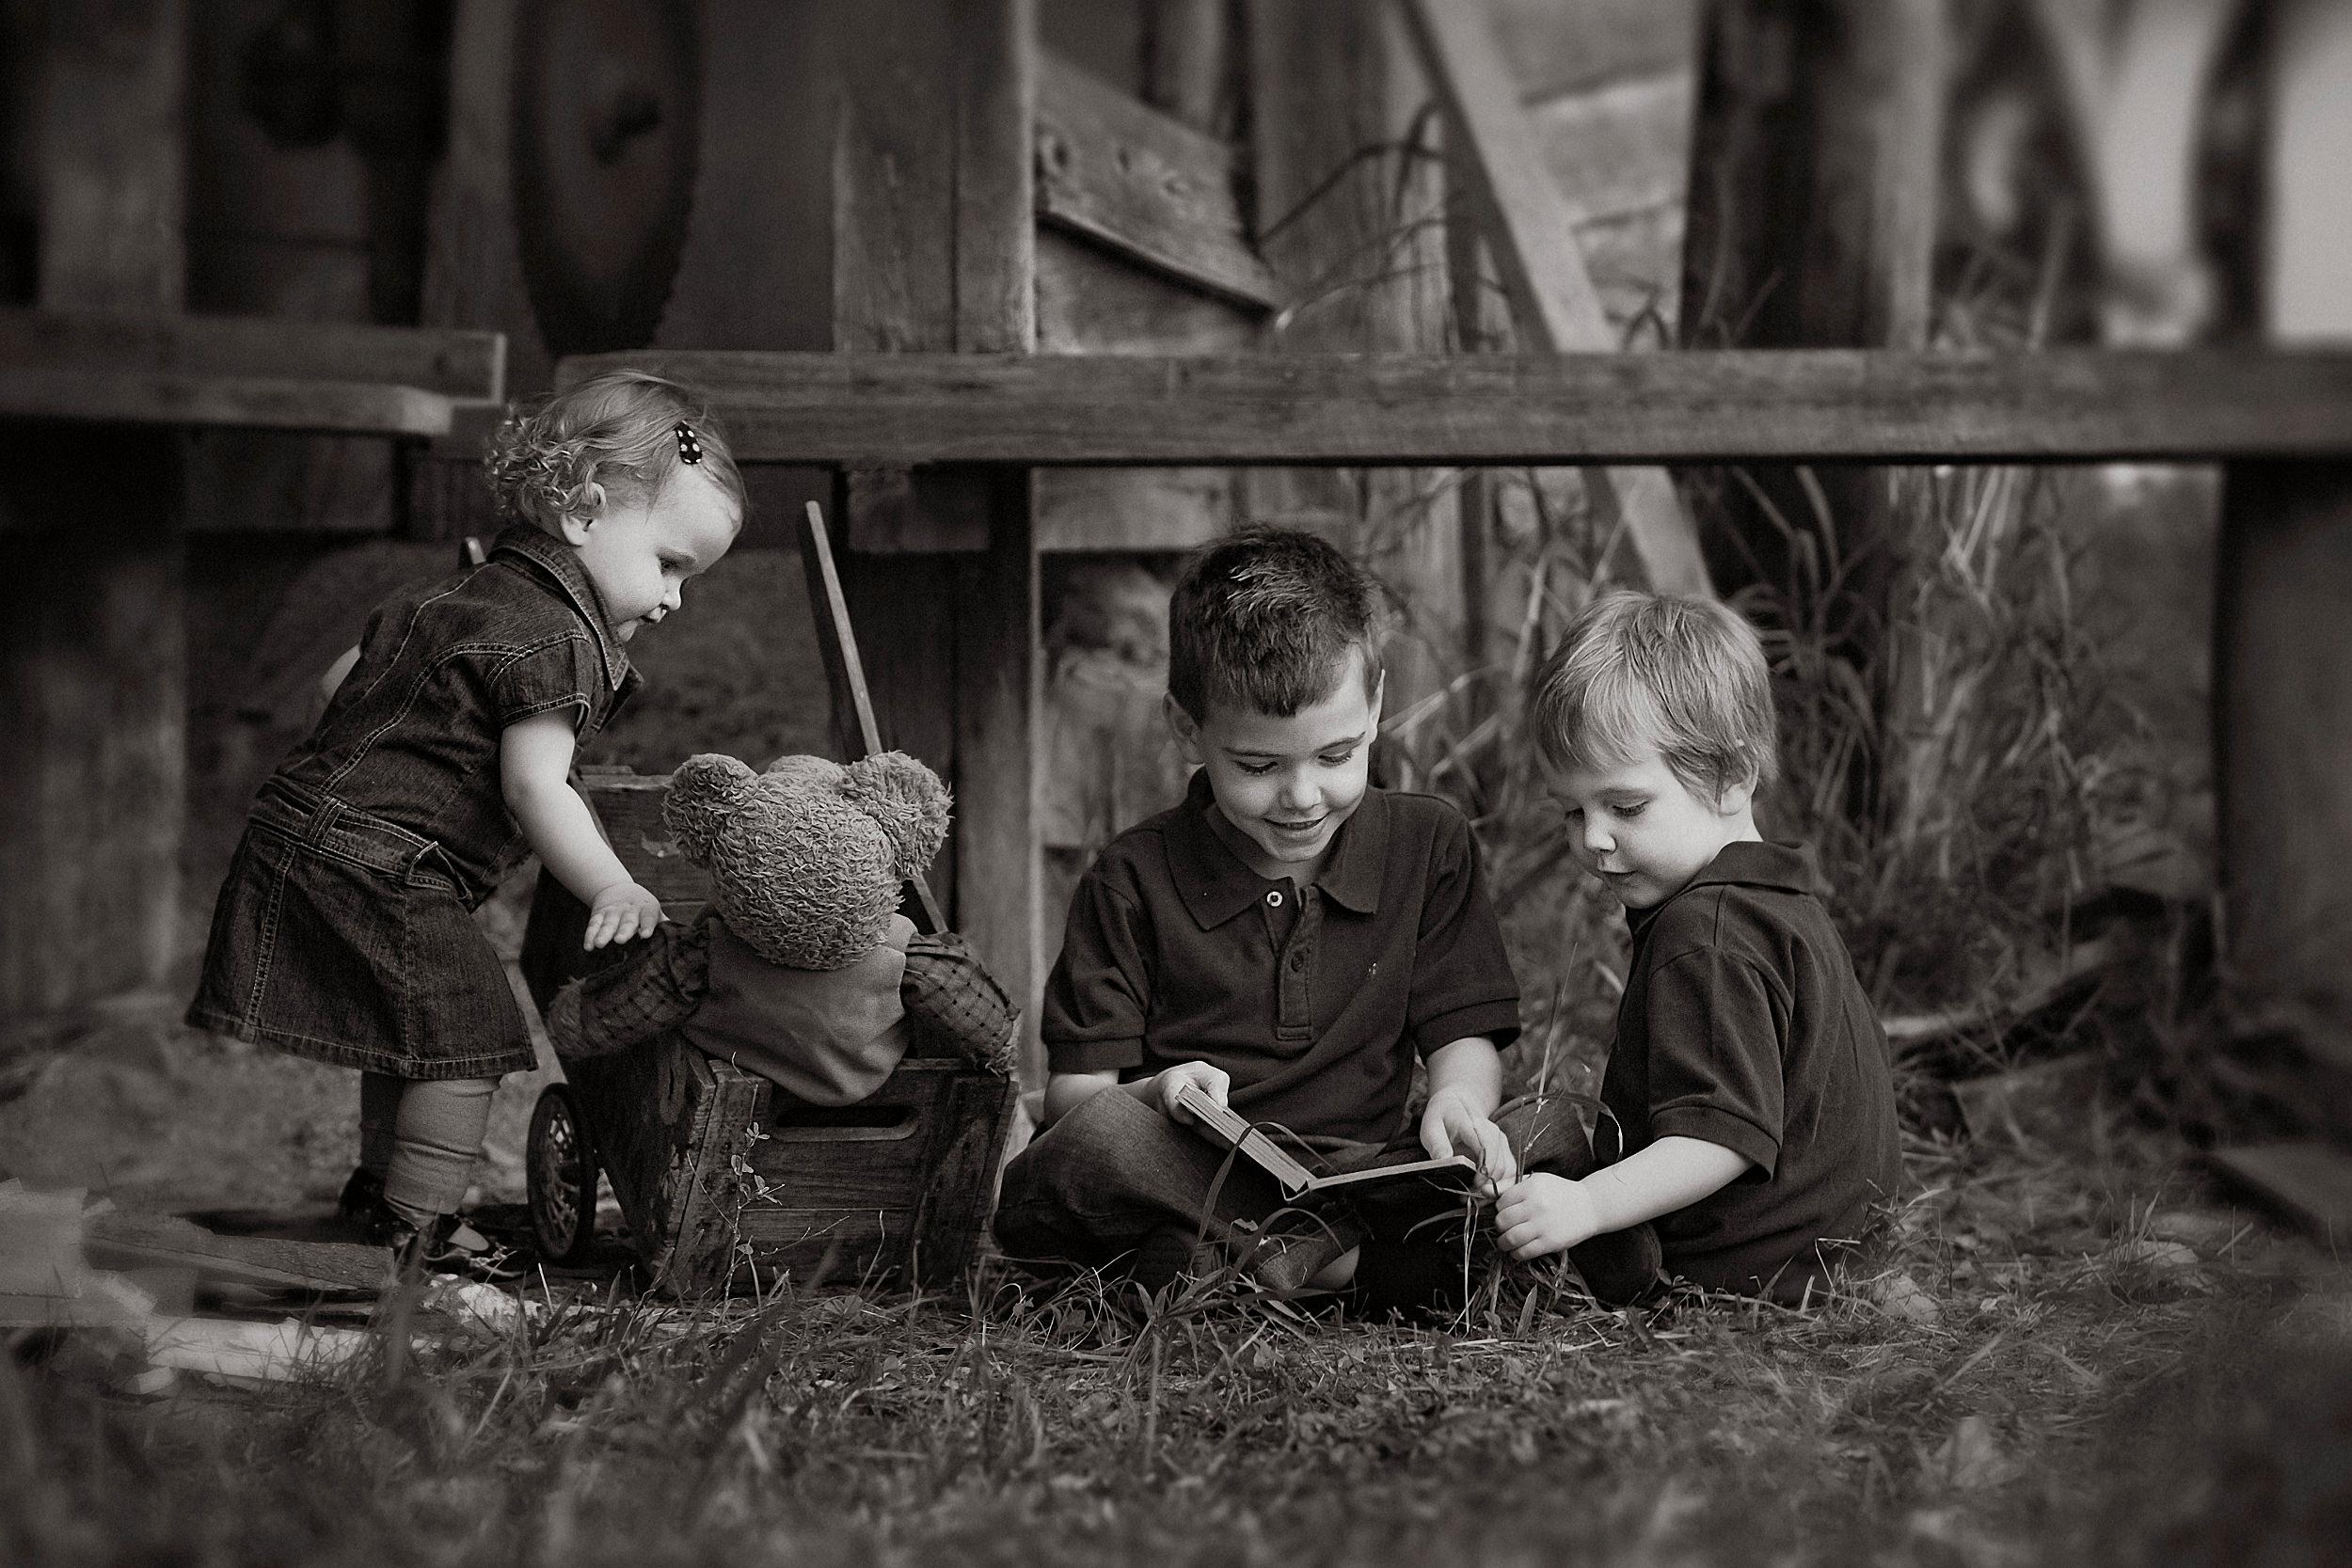 Gallery-kids portraits-black and white portraits-portraits.jpg